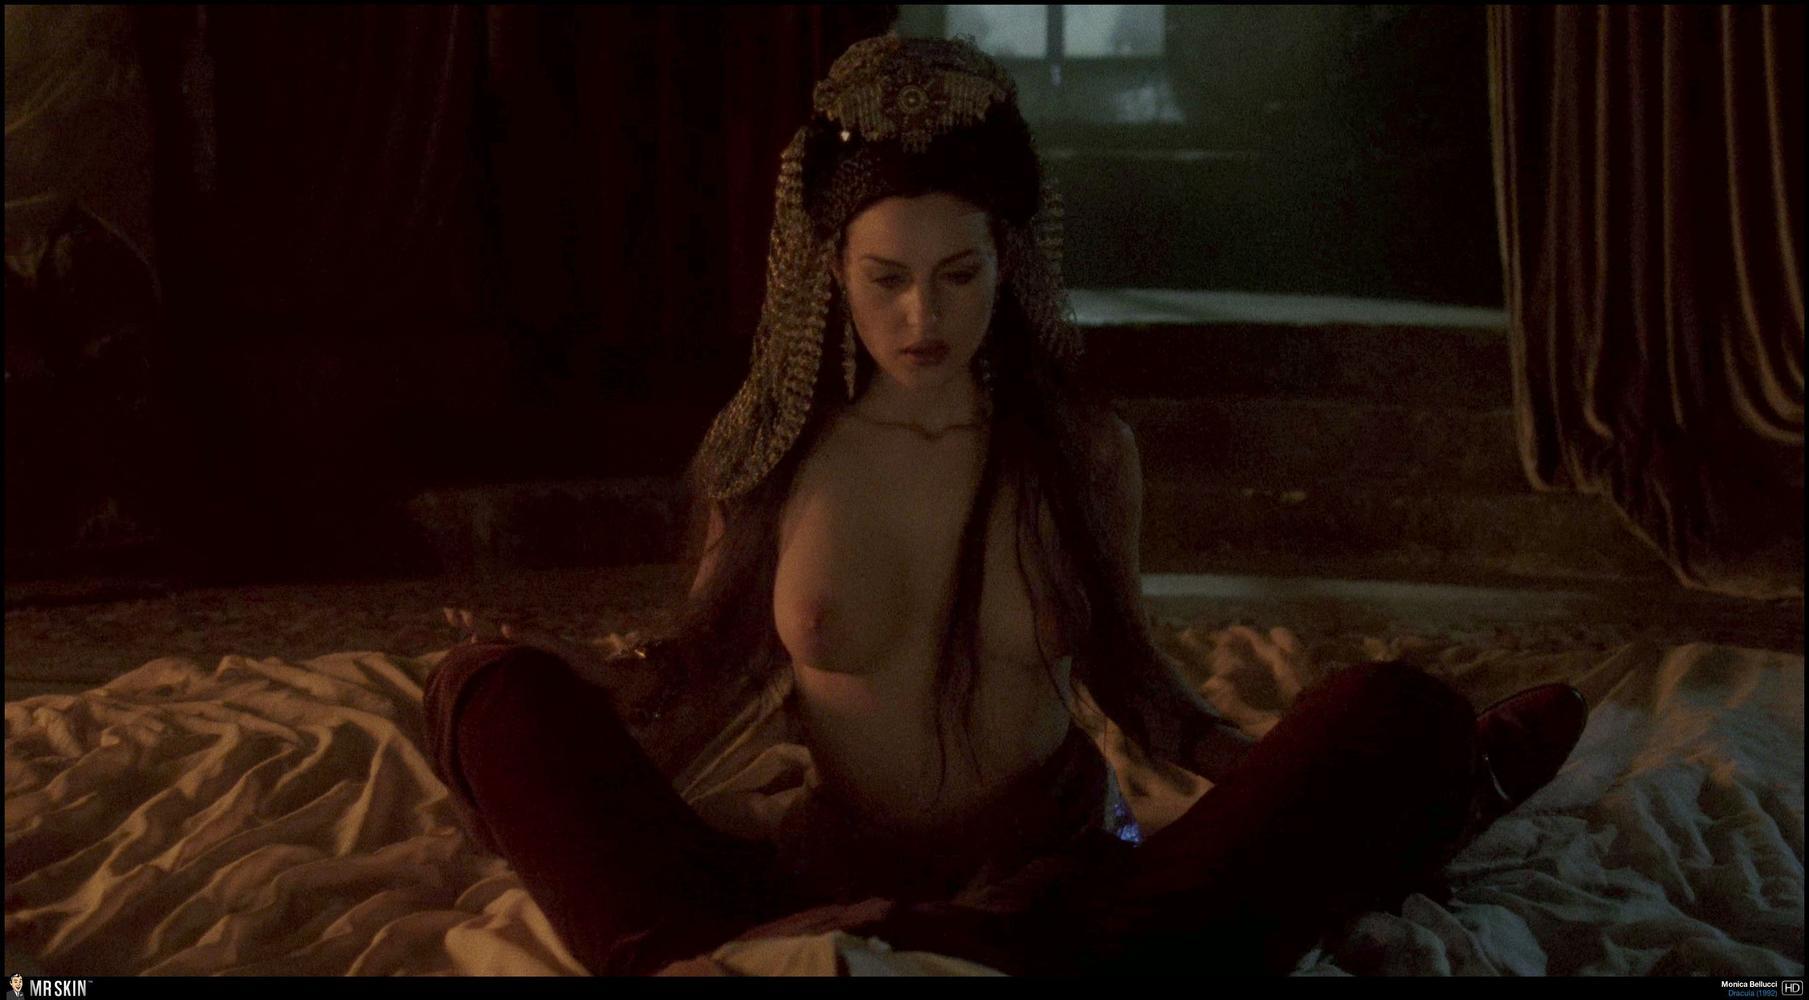 women double d tits nude